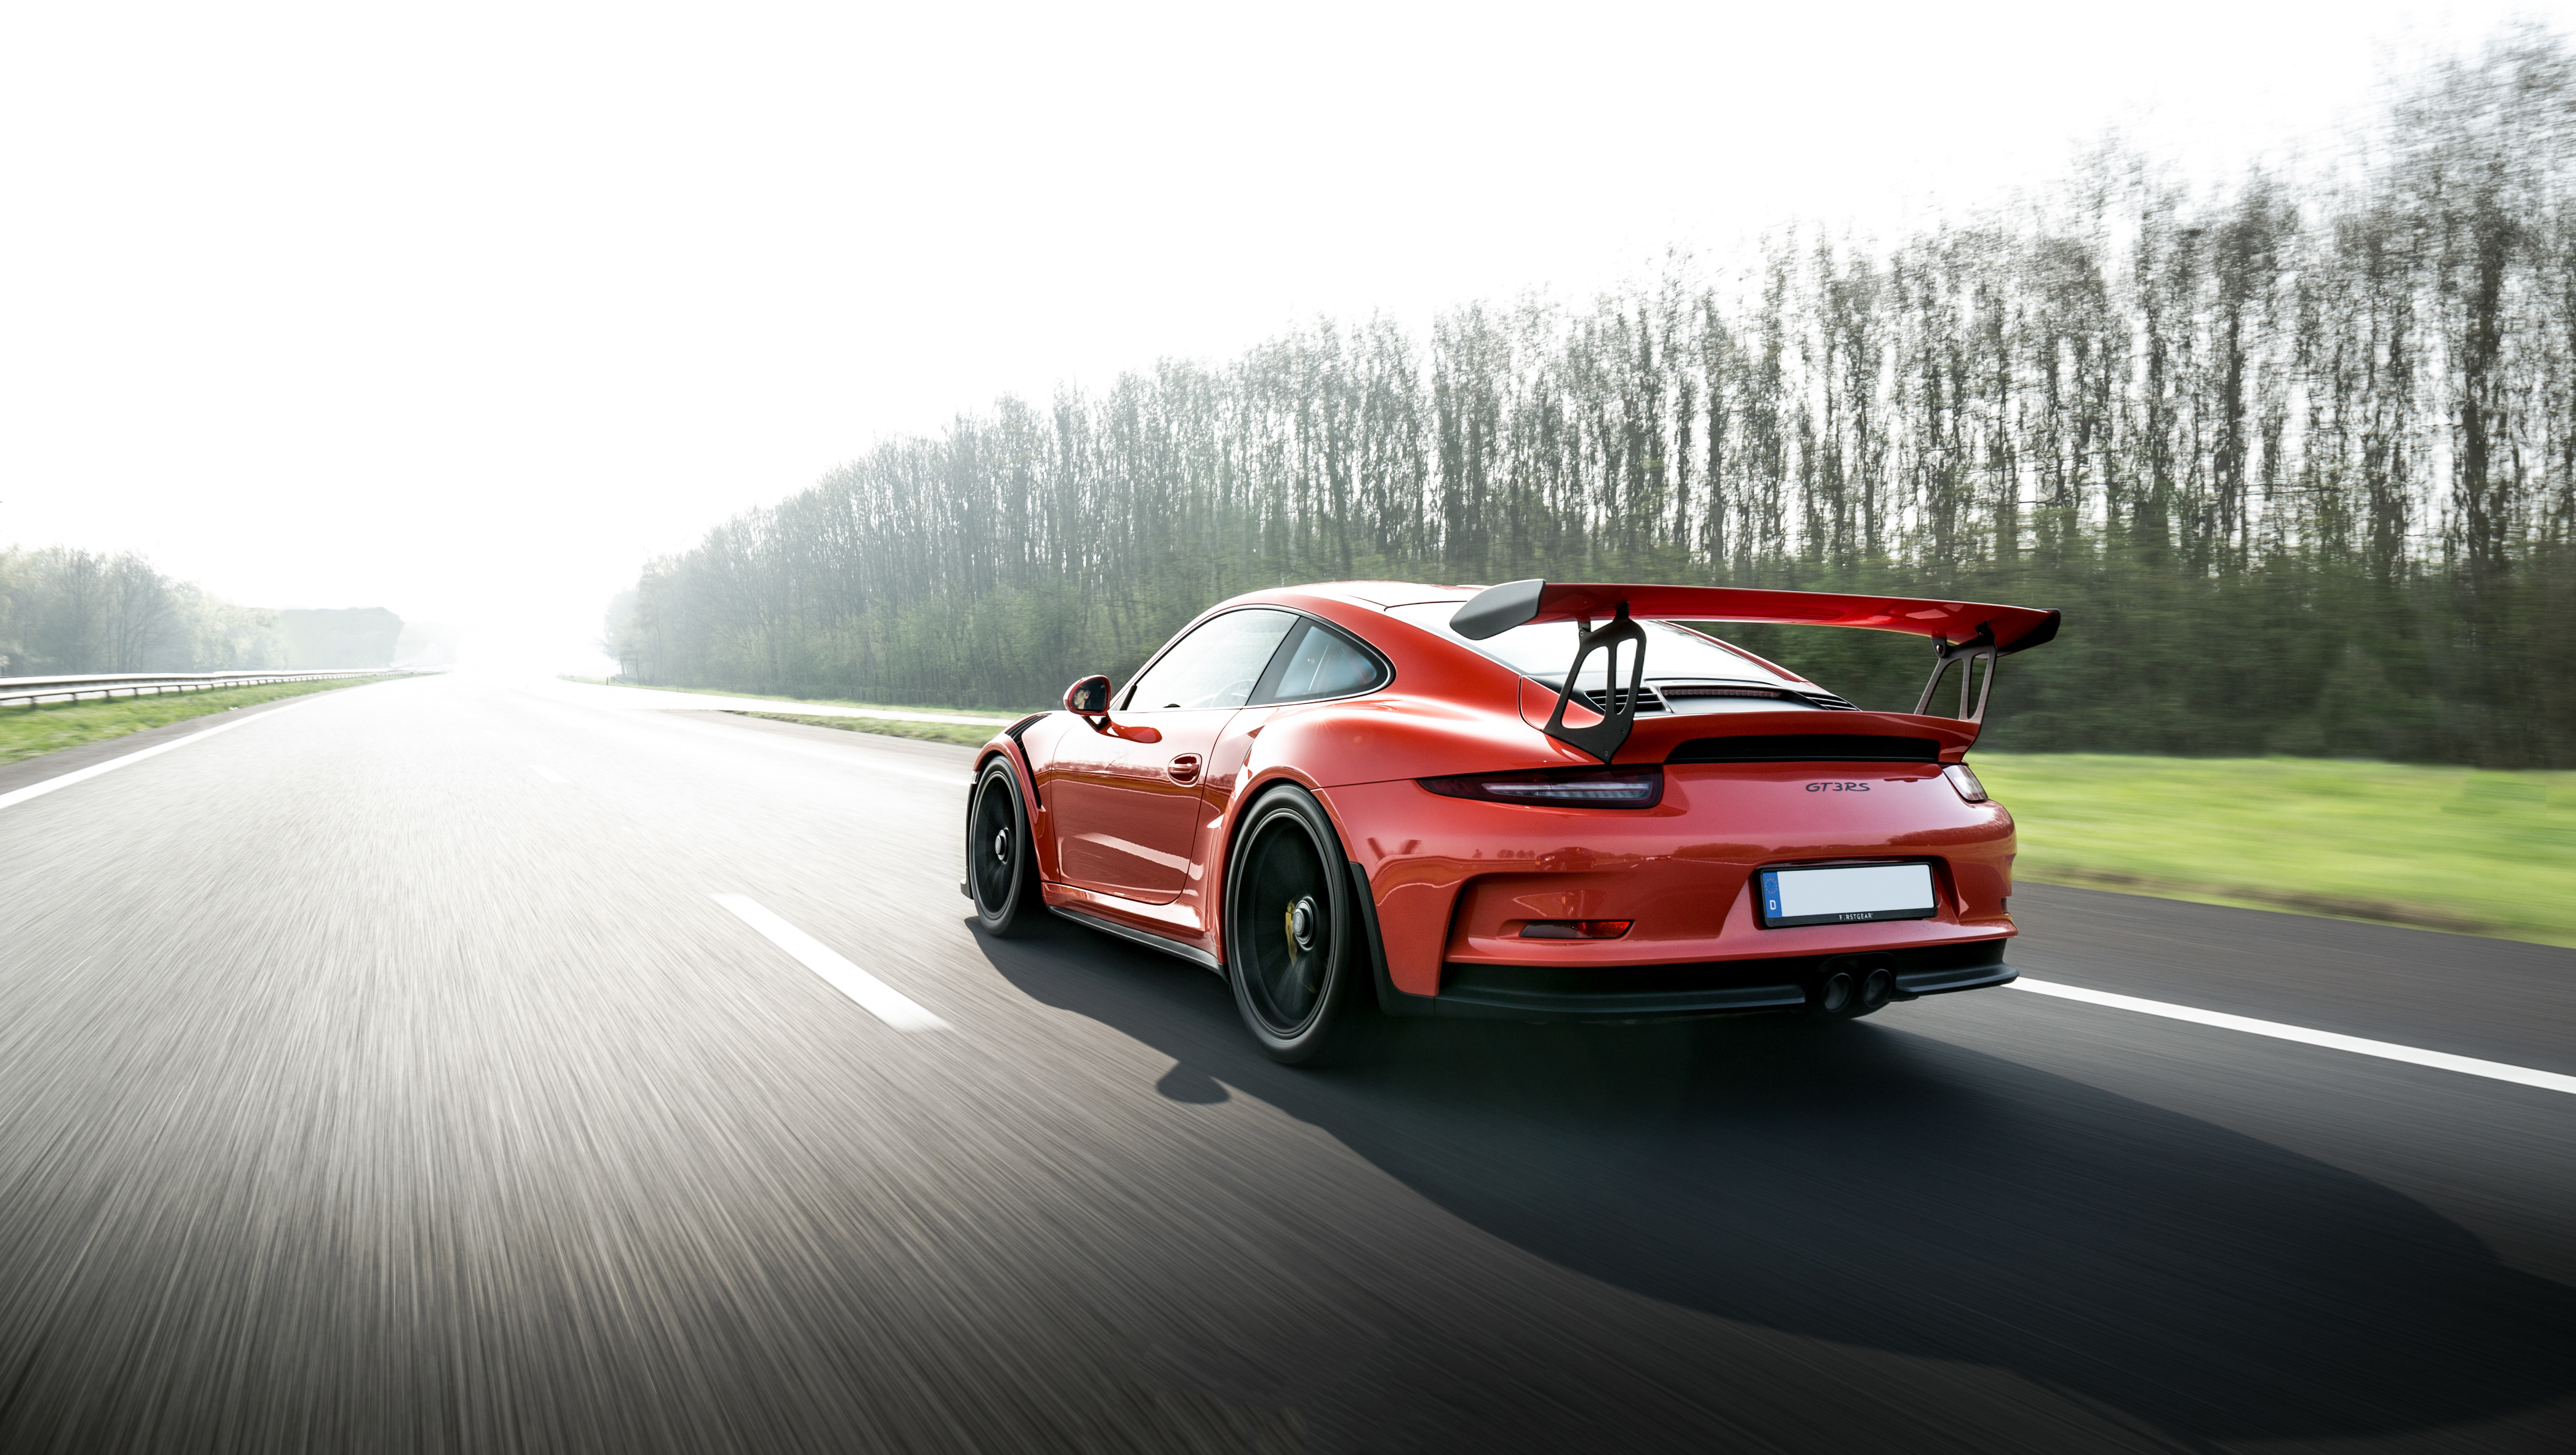 Porsche 911 GT3 RS 2018 5k Rear, HD Cars, 4k Wallpapers